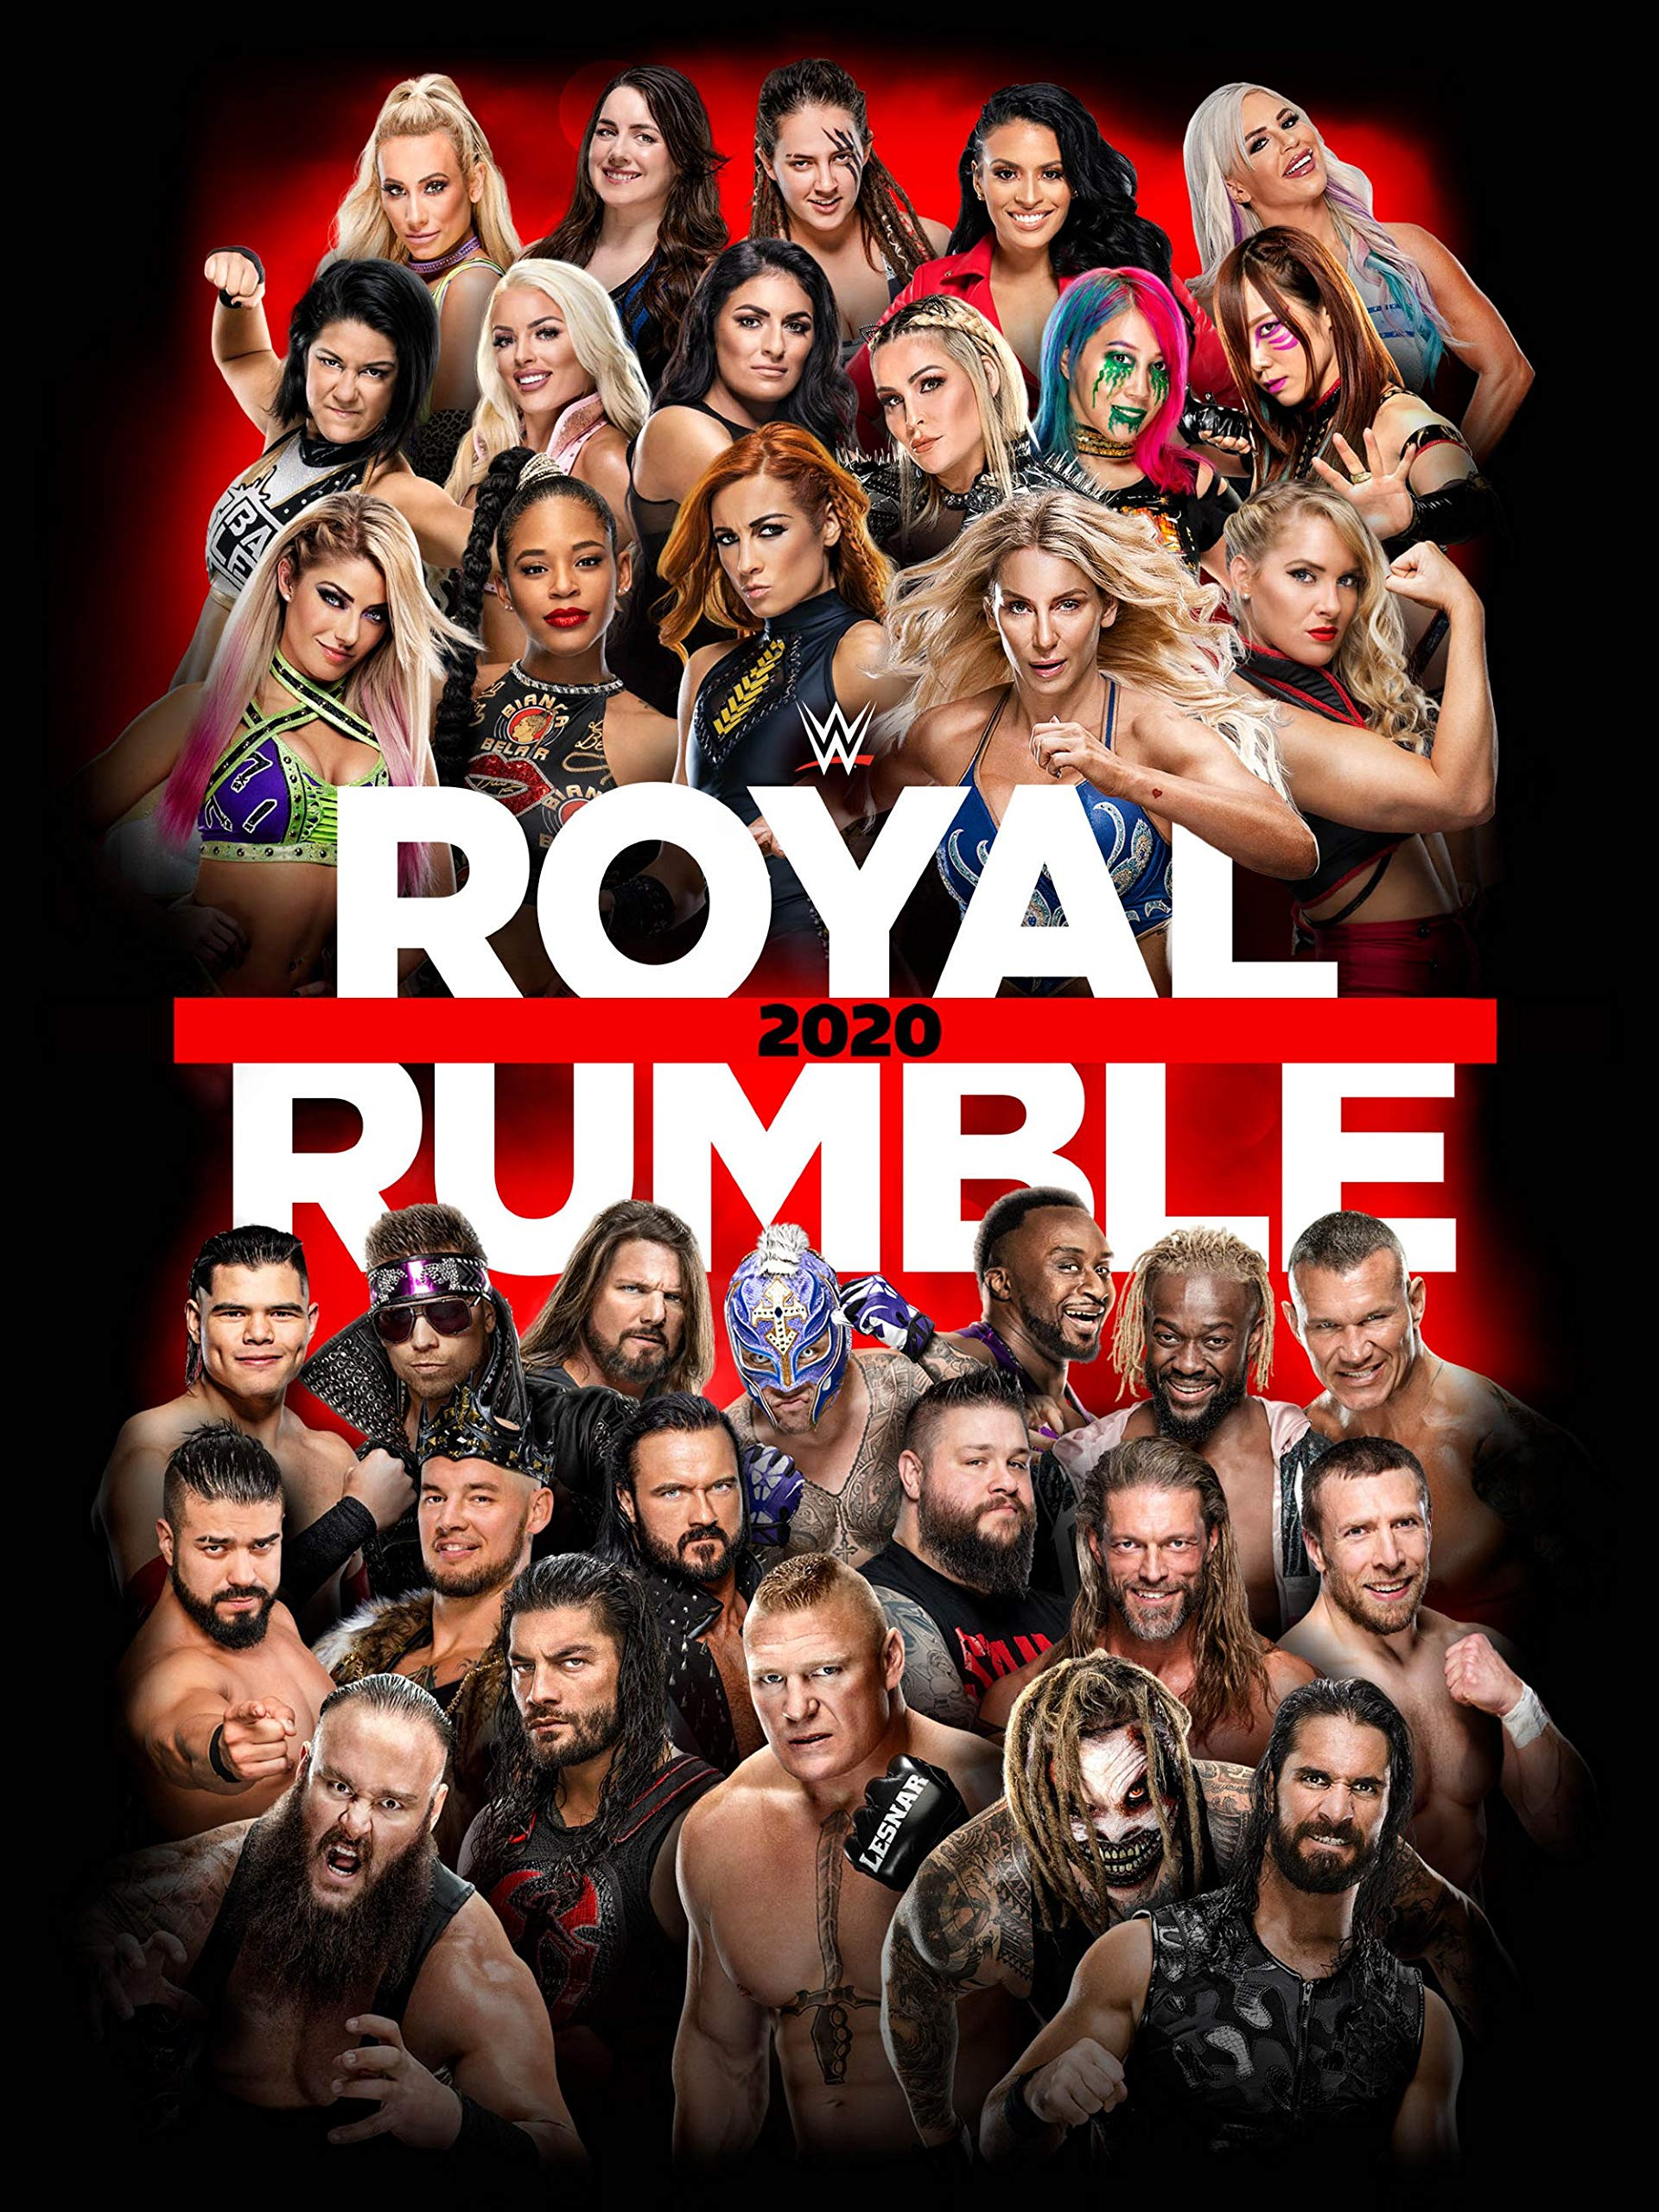 Watch WWE: Royal Rumble 2020 | Prime Video